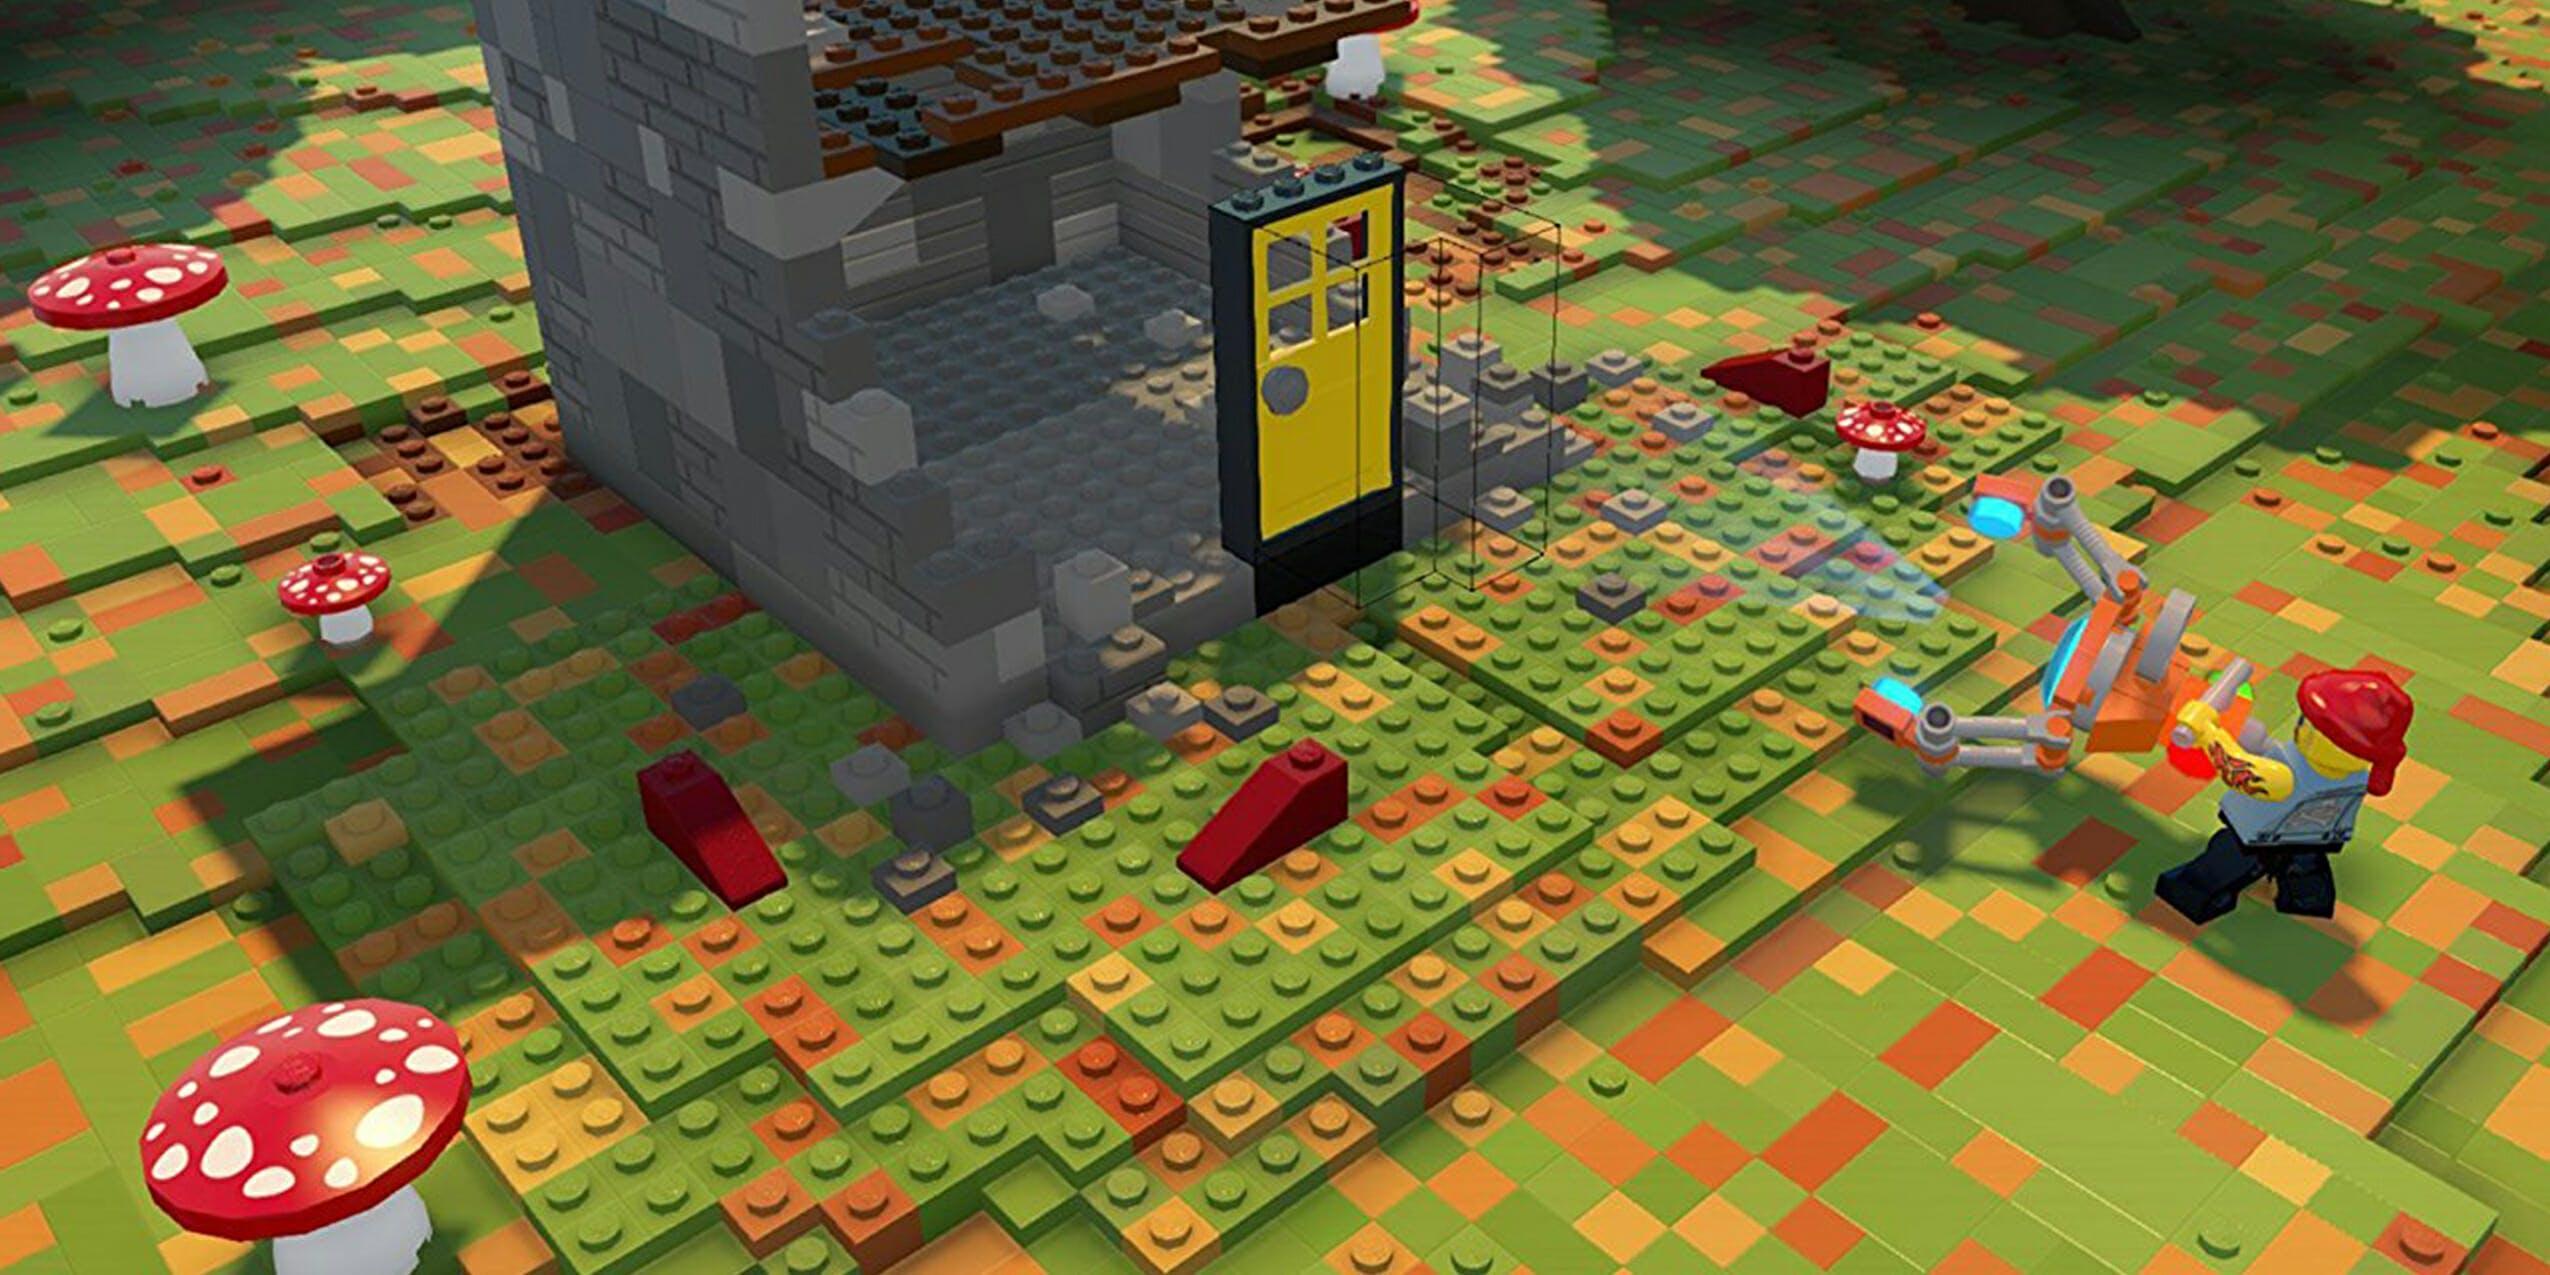 lego video games - lego worlds